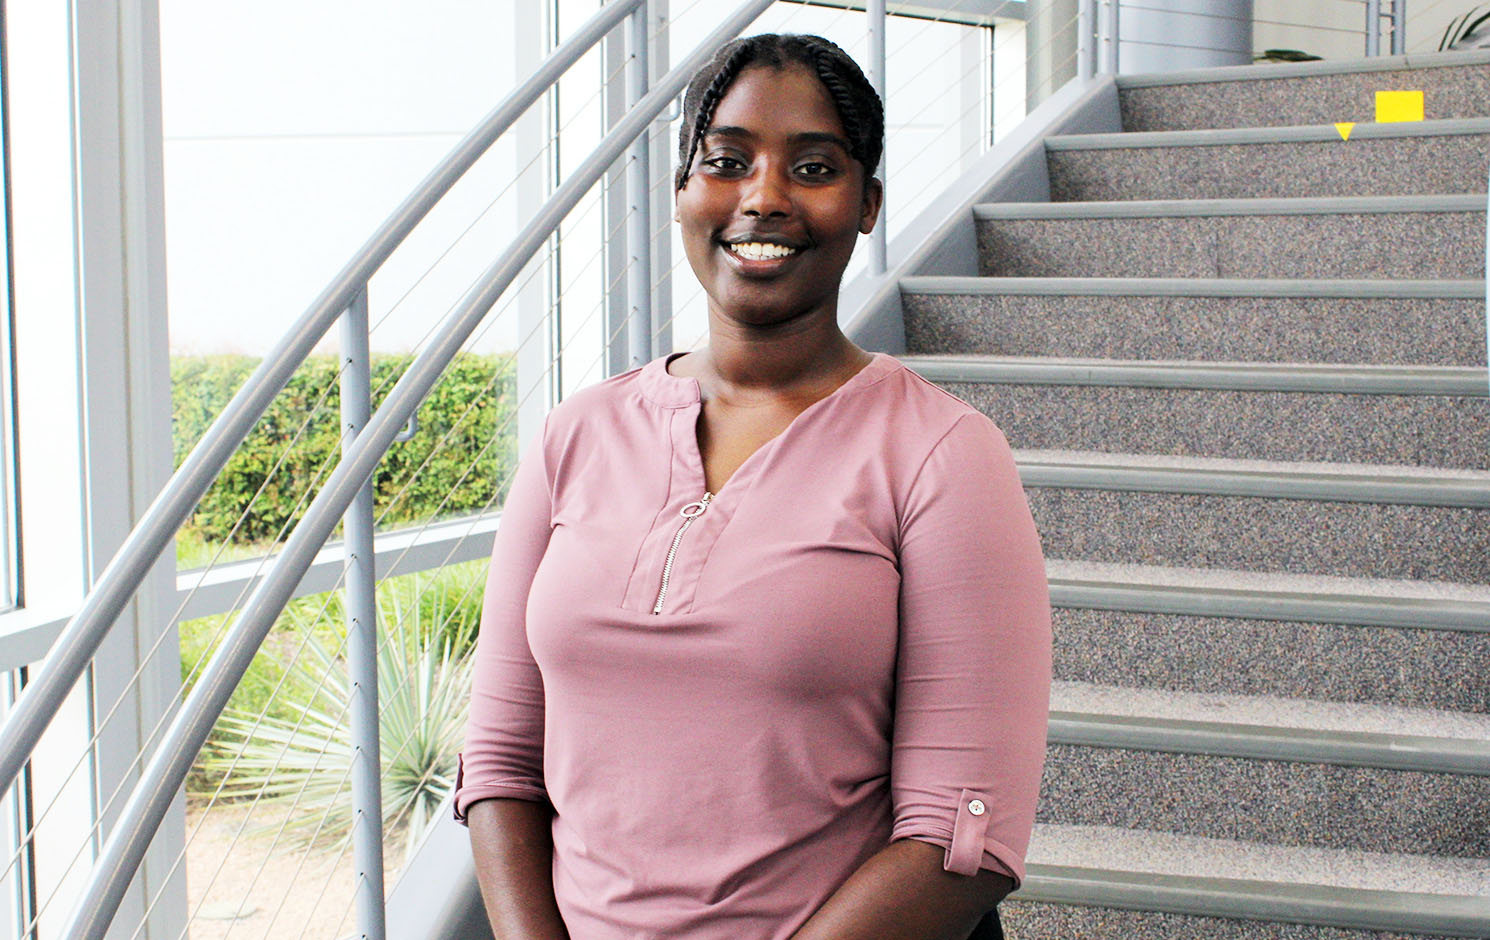 UTA electrical engineering student Tabita Barakagwira